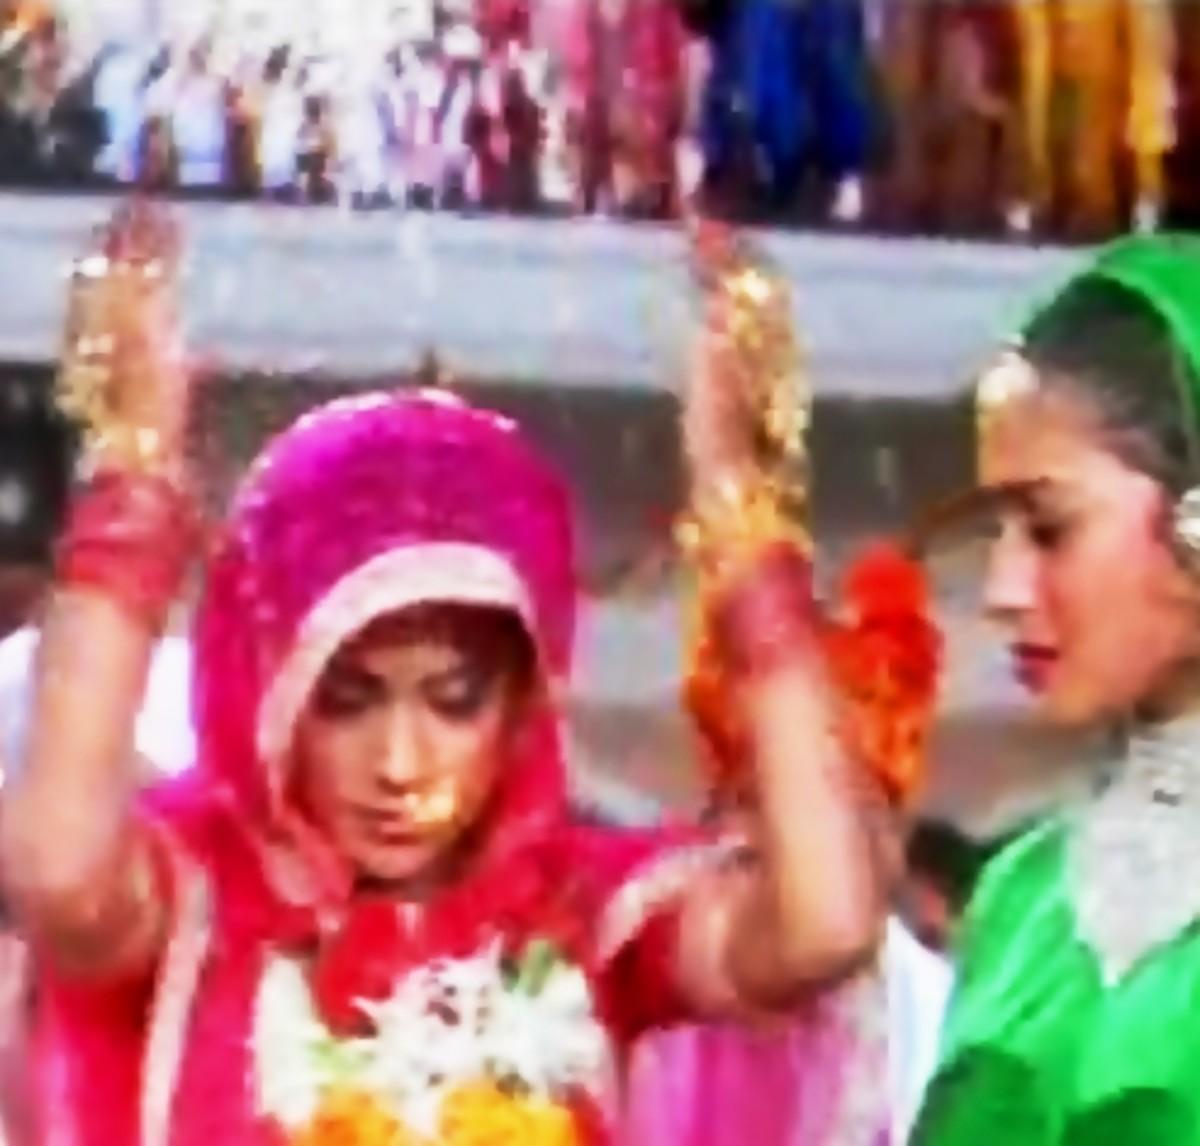 Madhuri Dixit and Renuka Sahane in Hum Aapke Hain Koun.  A great bidai song denoting wedding traditions of India.